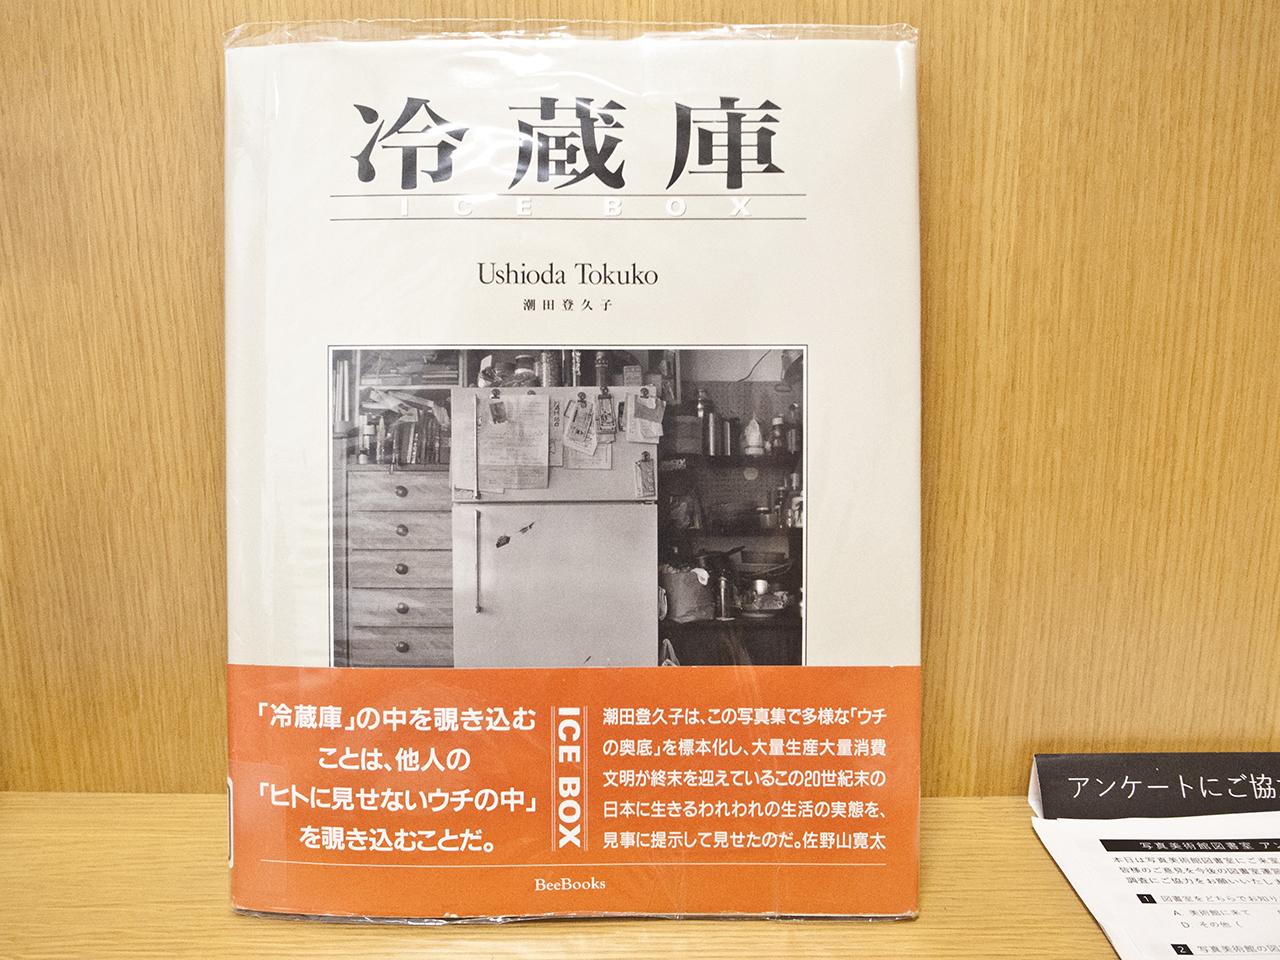 Jesse's Book Review – Ice Box by Ushioda Tokuko